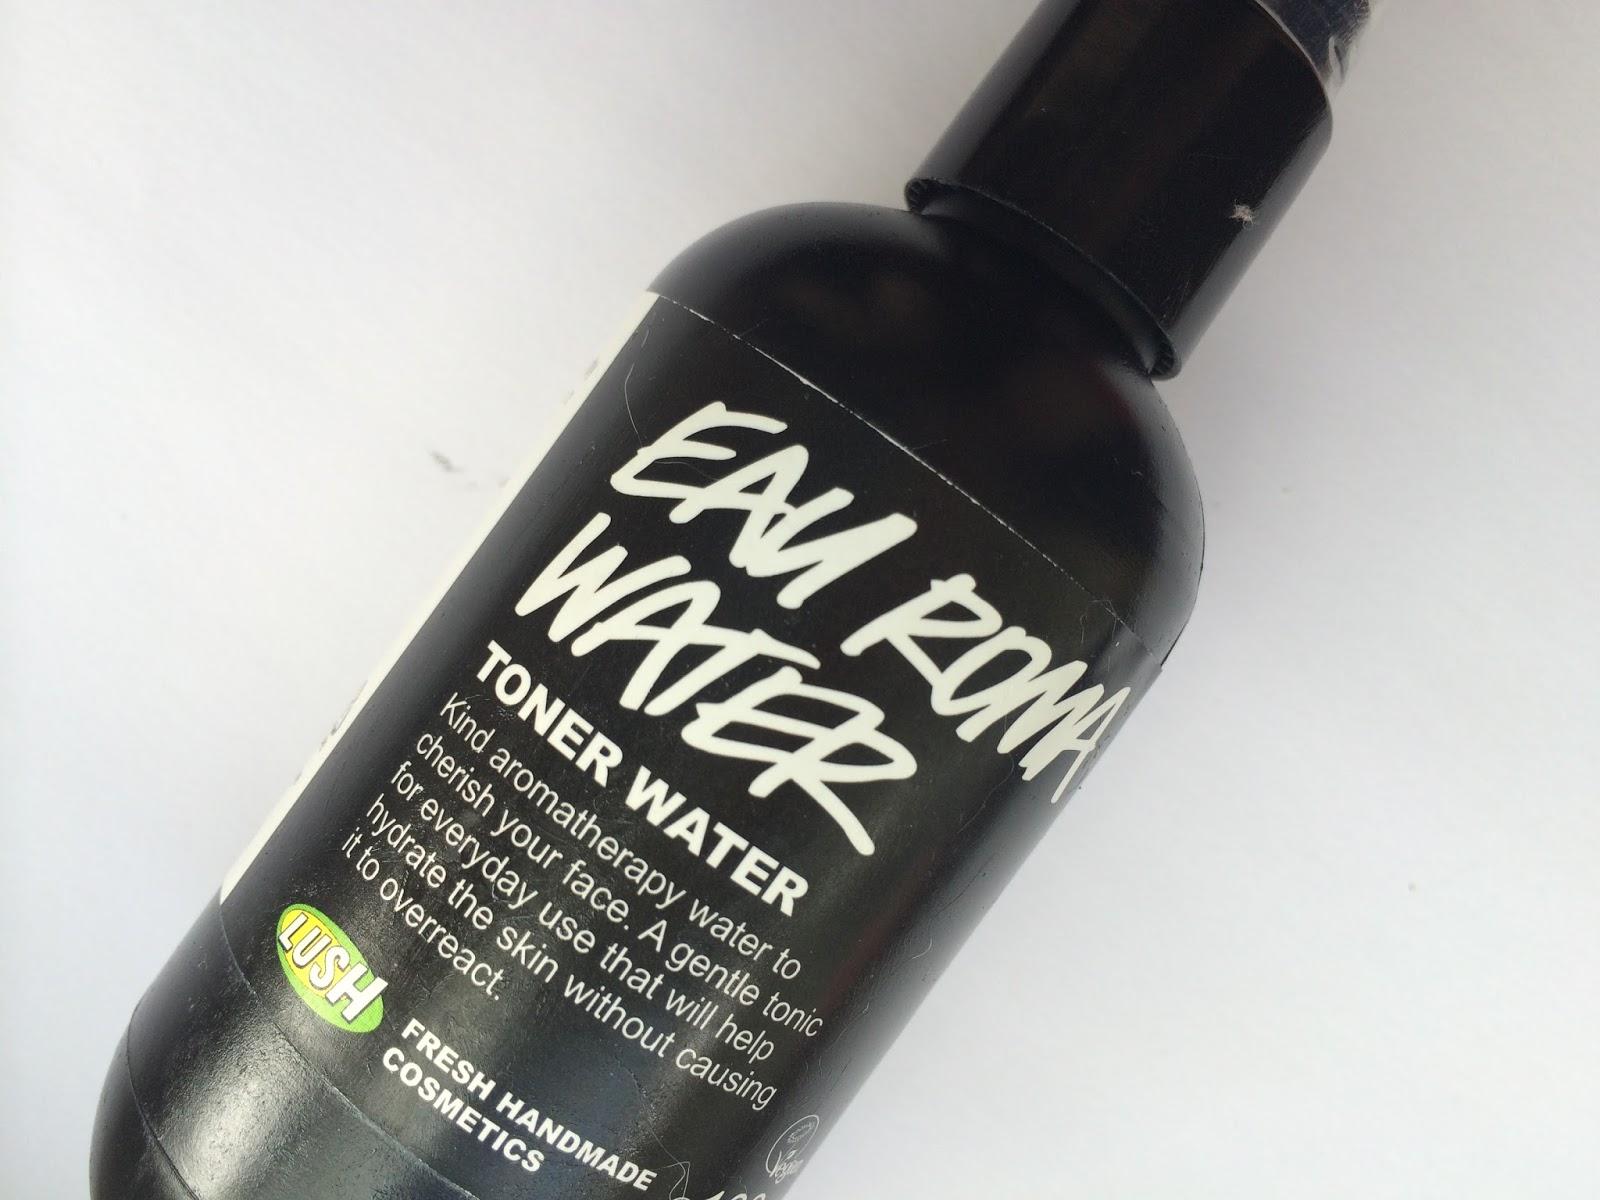 Lush Eau Roma Water Toner